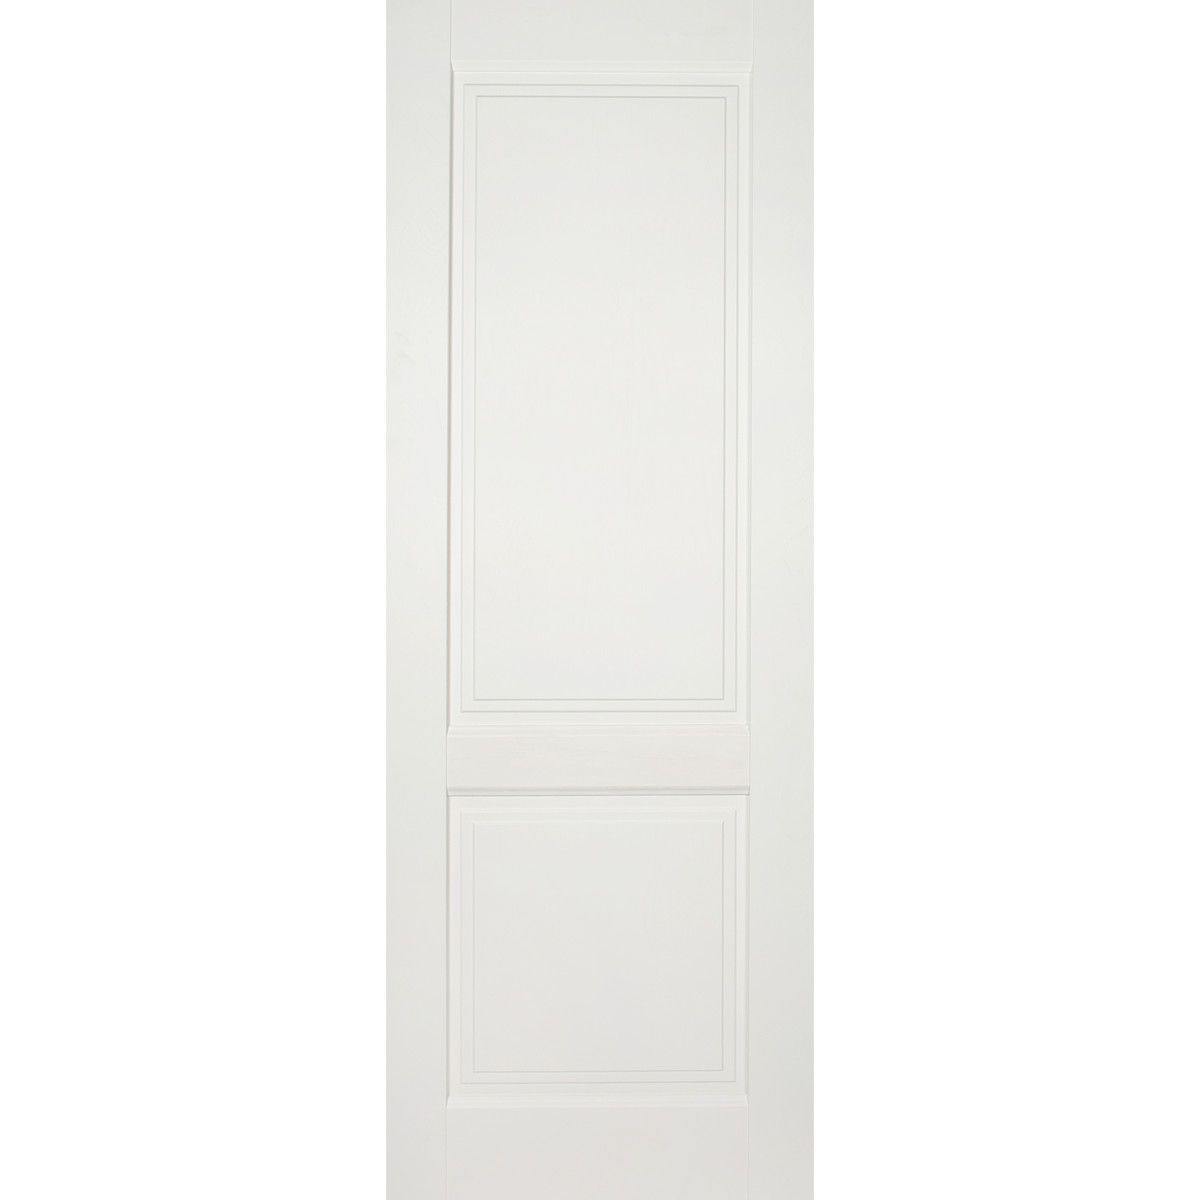 Дверь Межкомнатная Глухая Кристал 70x200 Цвет Пломбир